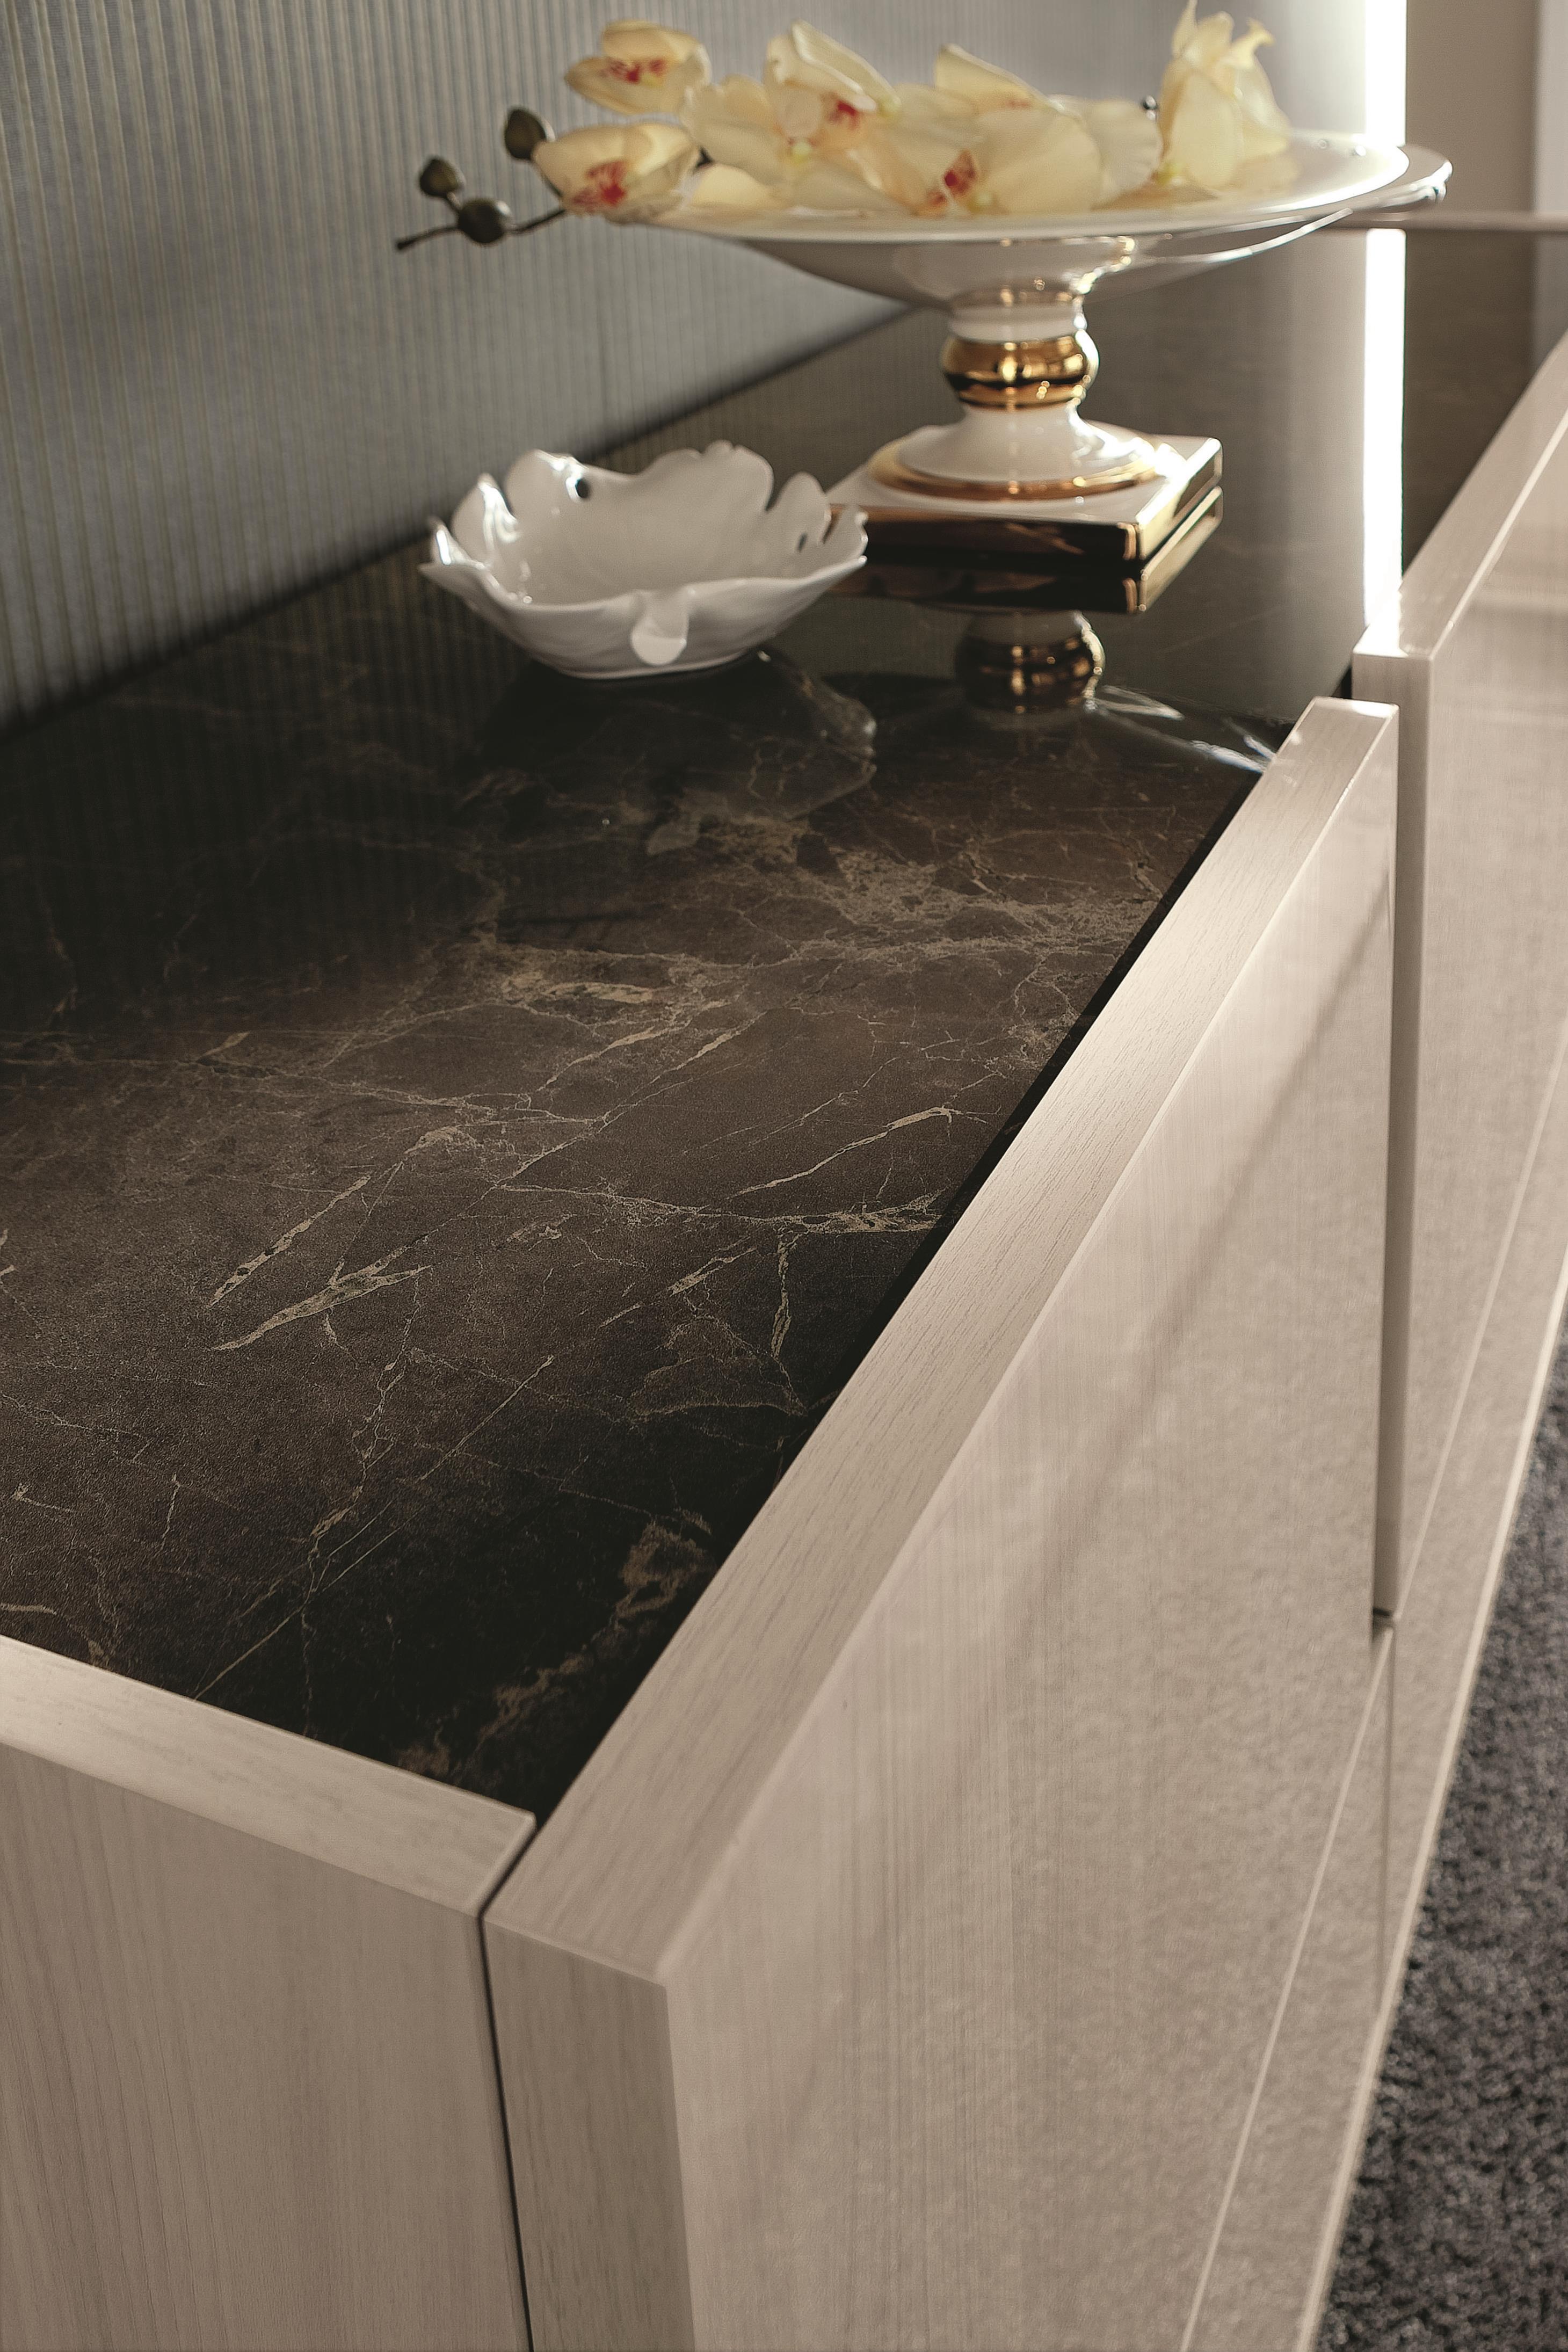 Teodora (kjte) by Alf Italia - HomeWorld Furniture - Alf ...